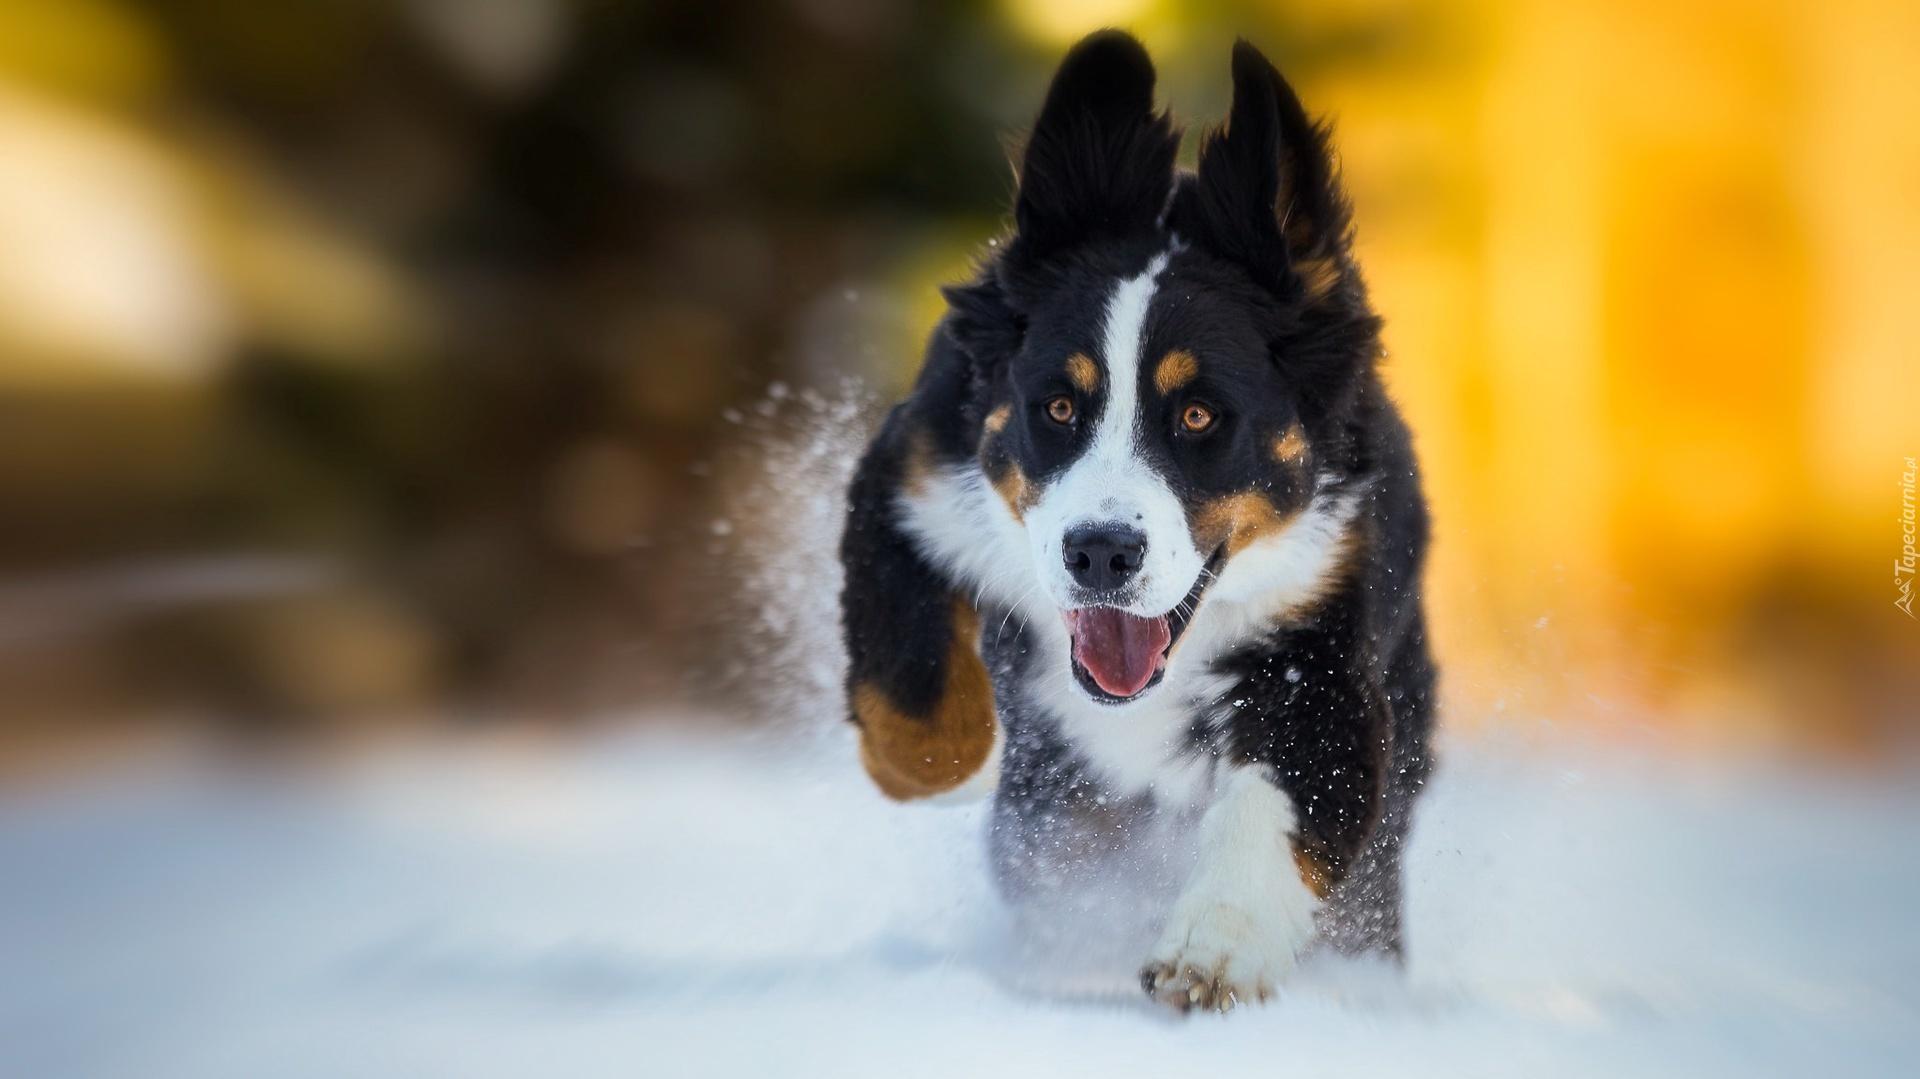 A Cute Puppy Wallpaper Mały Berneński Pies Pasterski Biegnie Po śniegu